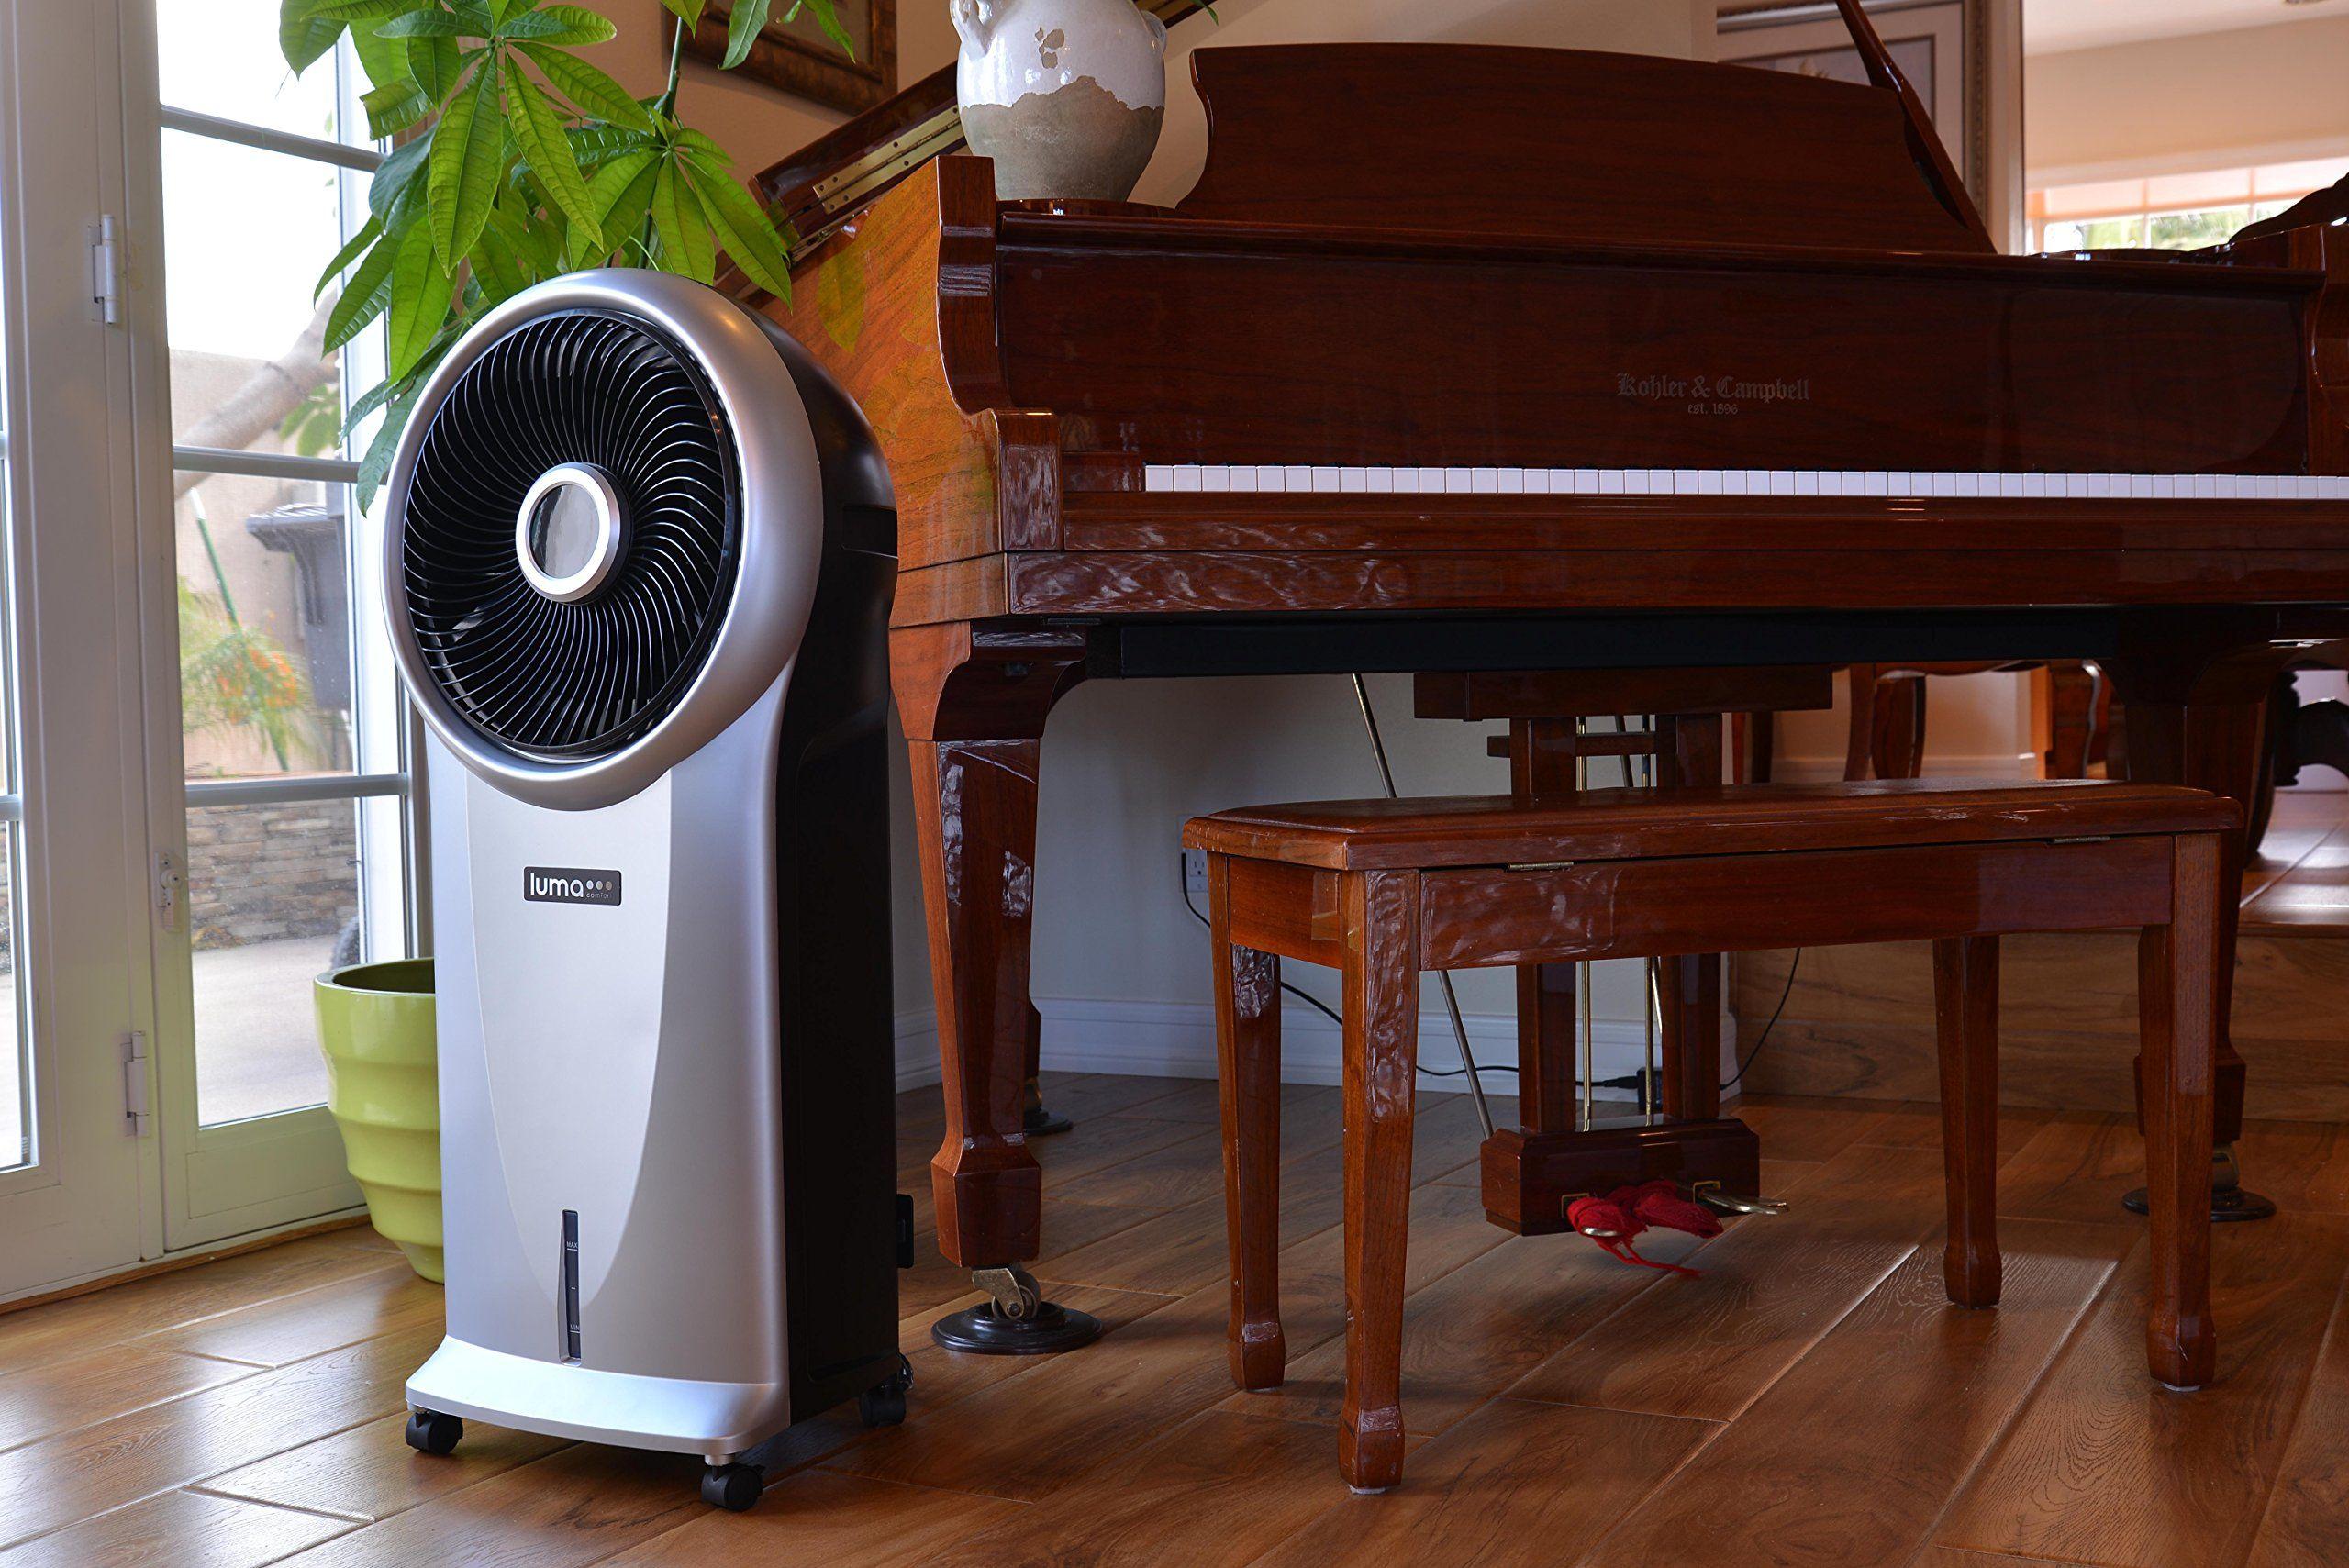 Luma Comfort EC110S Portable Evaporative Cooler with 250